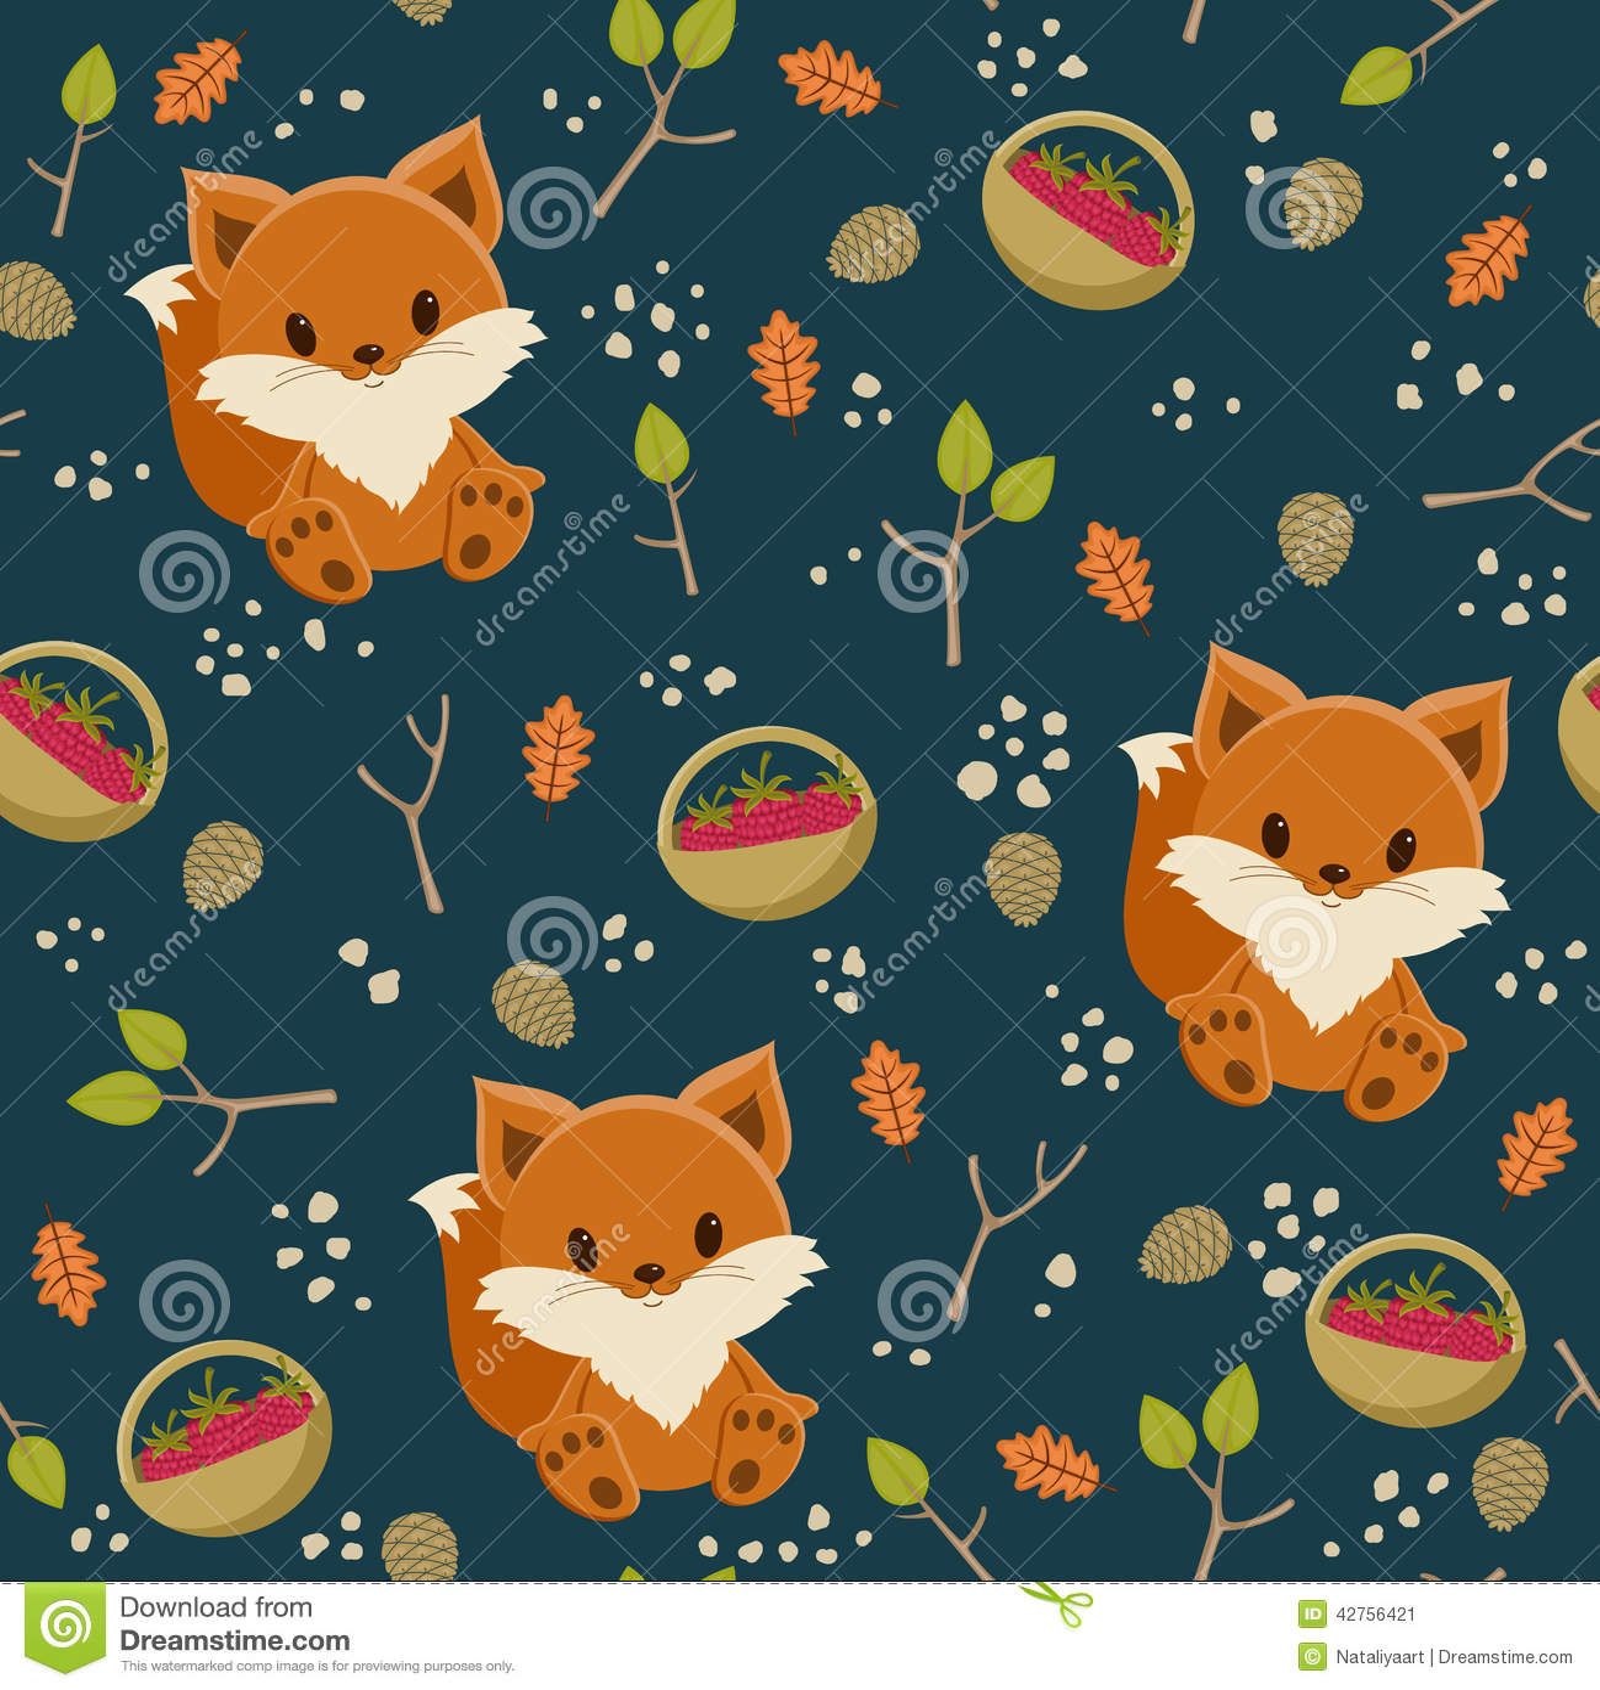 Seamless Fox Wallpaper Stock Vector Image 42756421